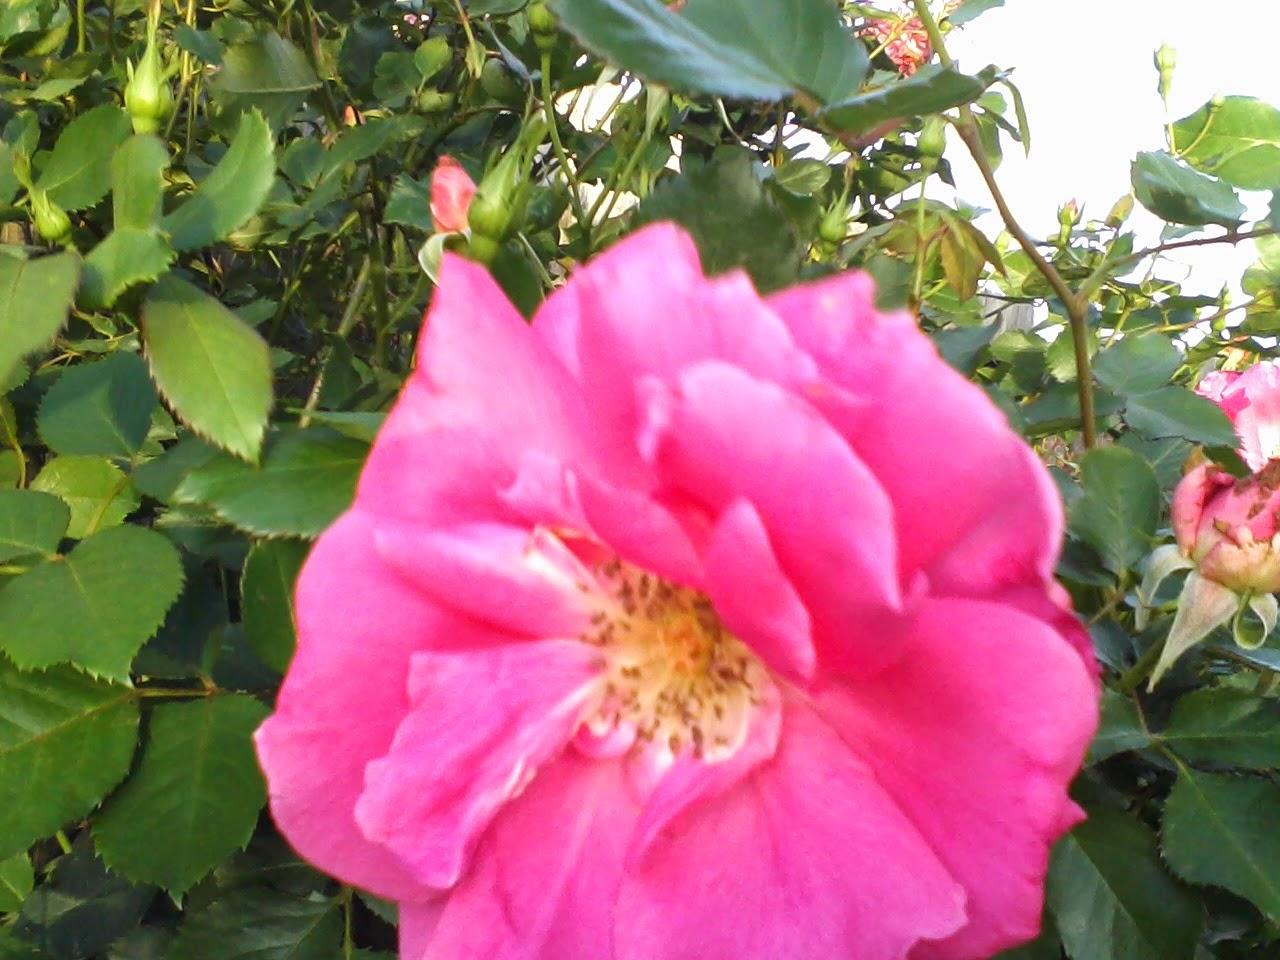 Gardening 2014 - 0412185852.jpg